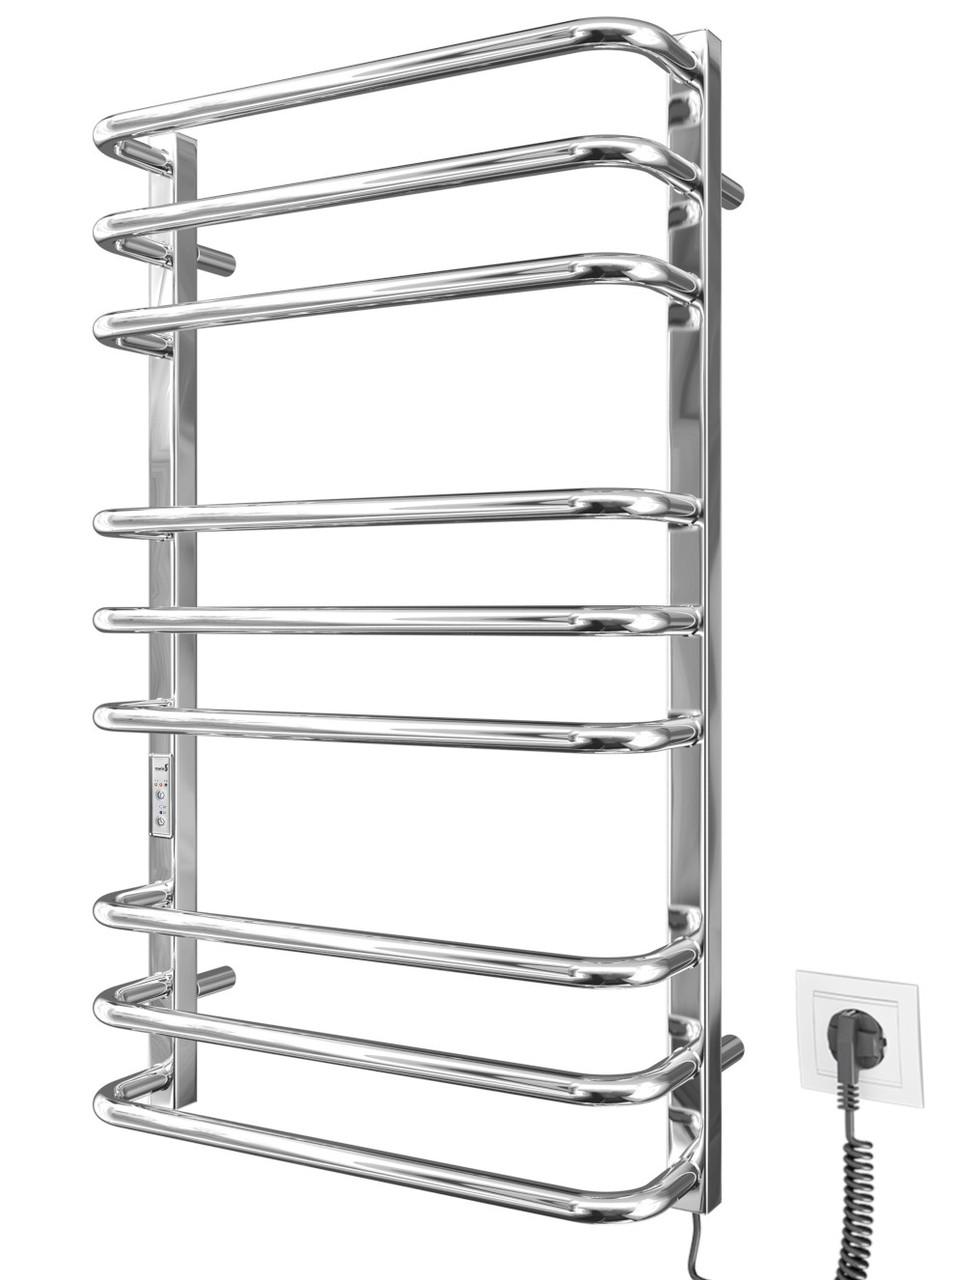 Электрический полотенцесушитель MARIO Премиум Стандарт-I 800x500/170 TR таймер-регулятор